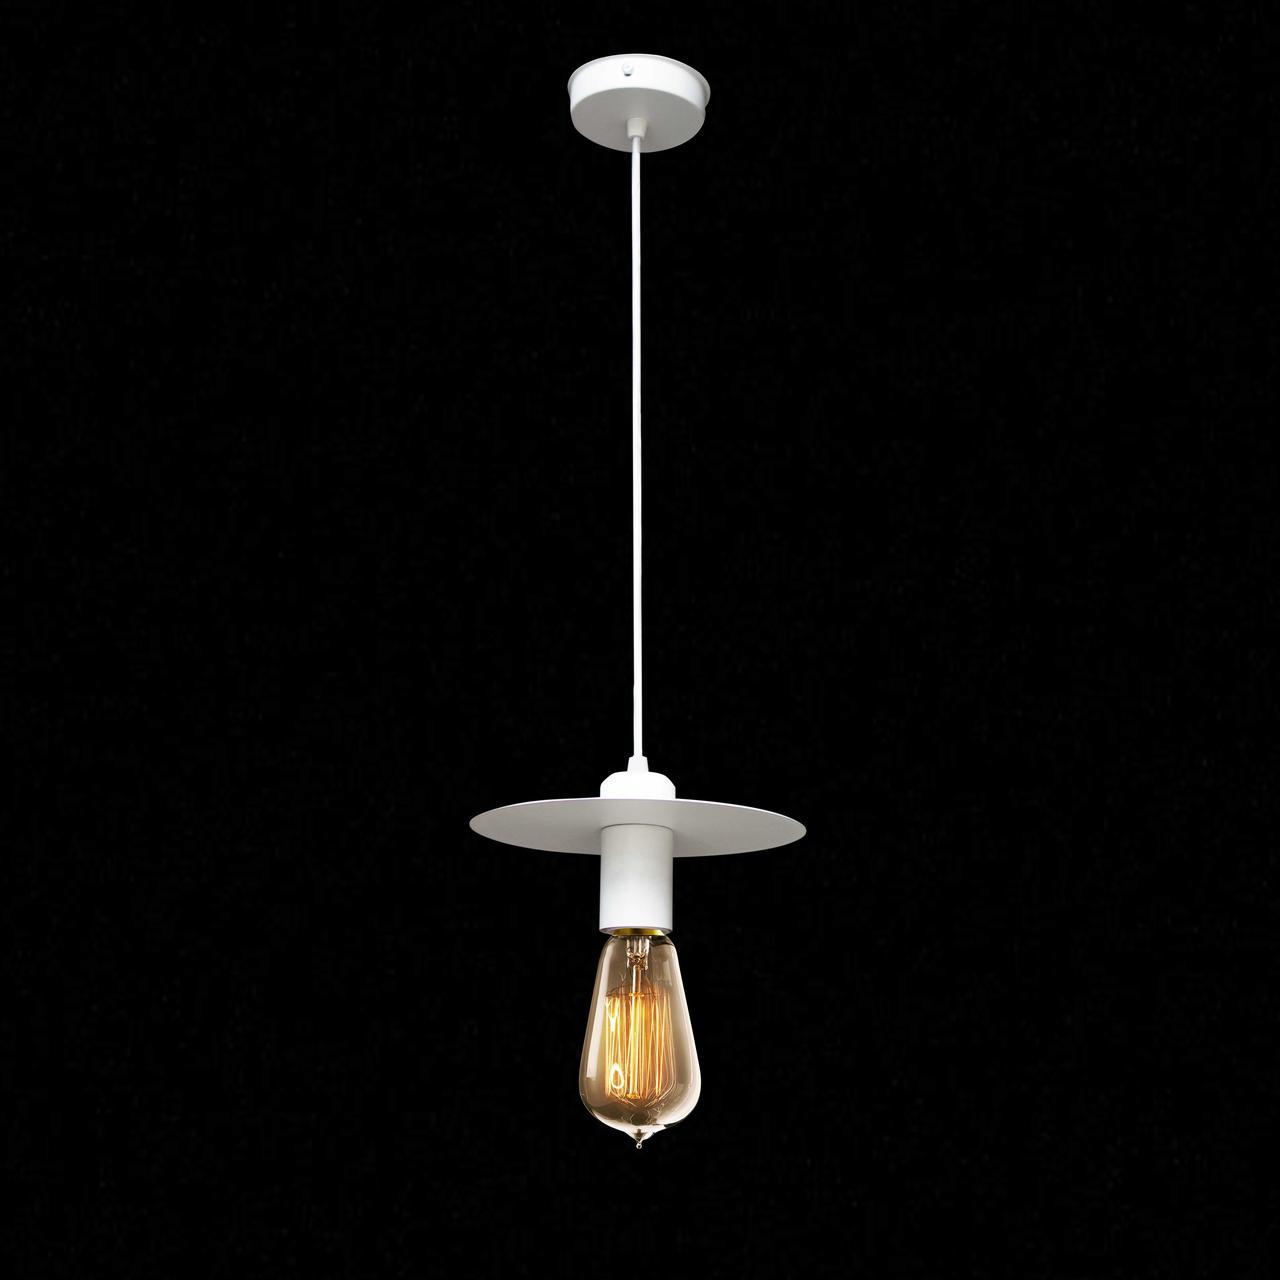 Светильник подвесной в стиле лофт NL 2009 WH  MSK Electric